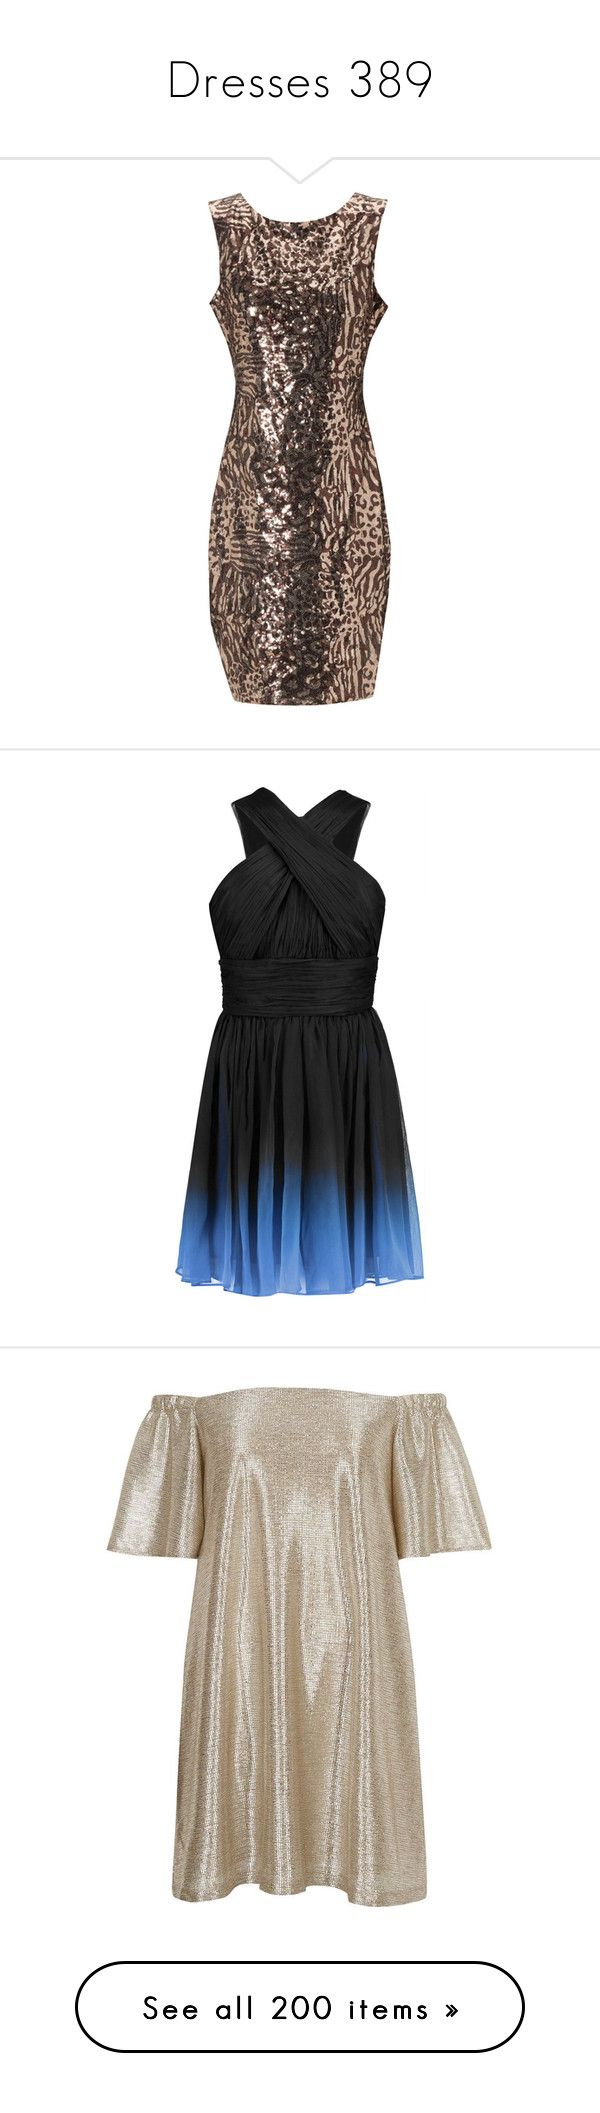 """Dresses 389"" by singlemom ❤ liked on Polyvore featuring dresses, bronze, sexy short dresses, sexy dresses, animal print dress, short summer dresses, summer cocktail dresses, short dresses, vestidos and black"